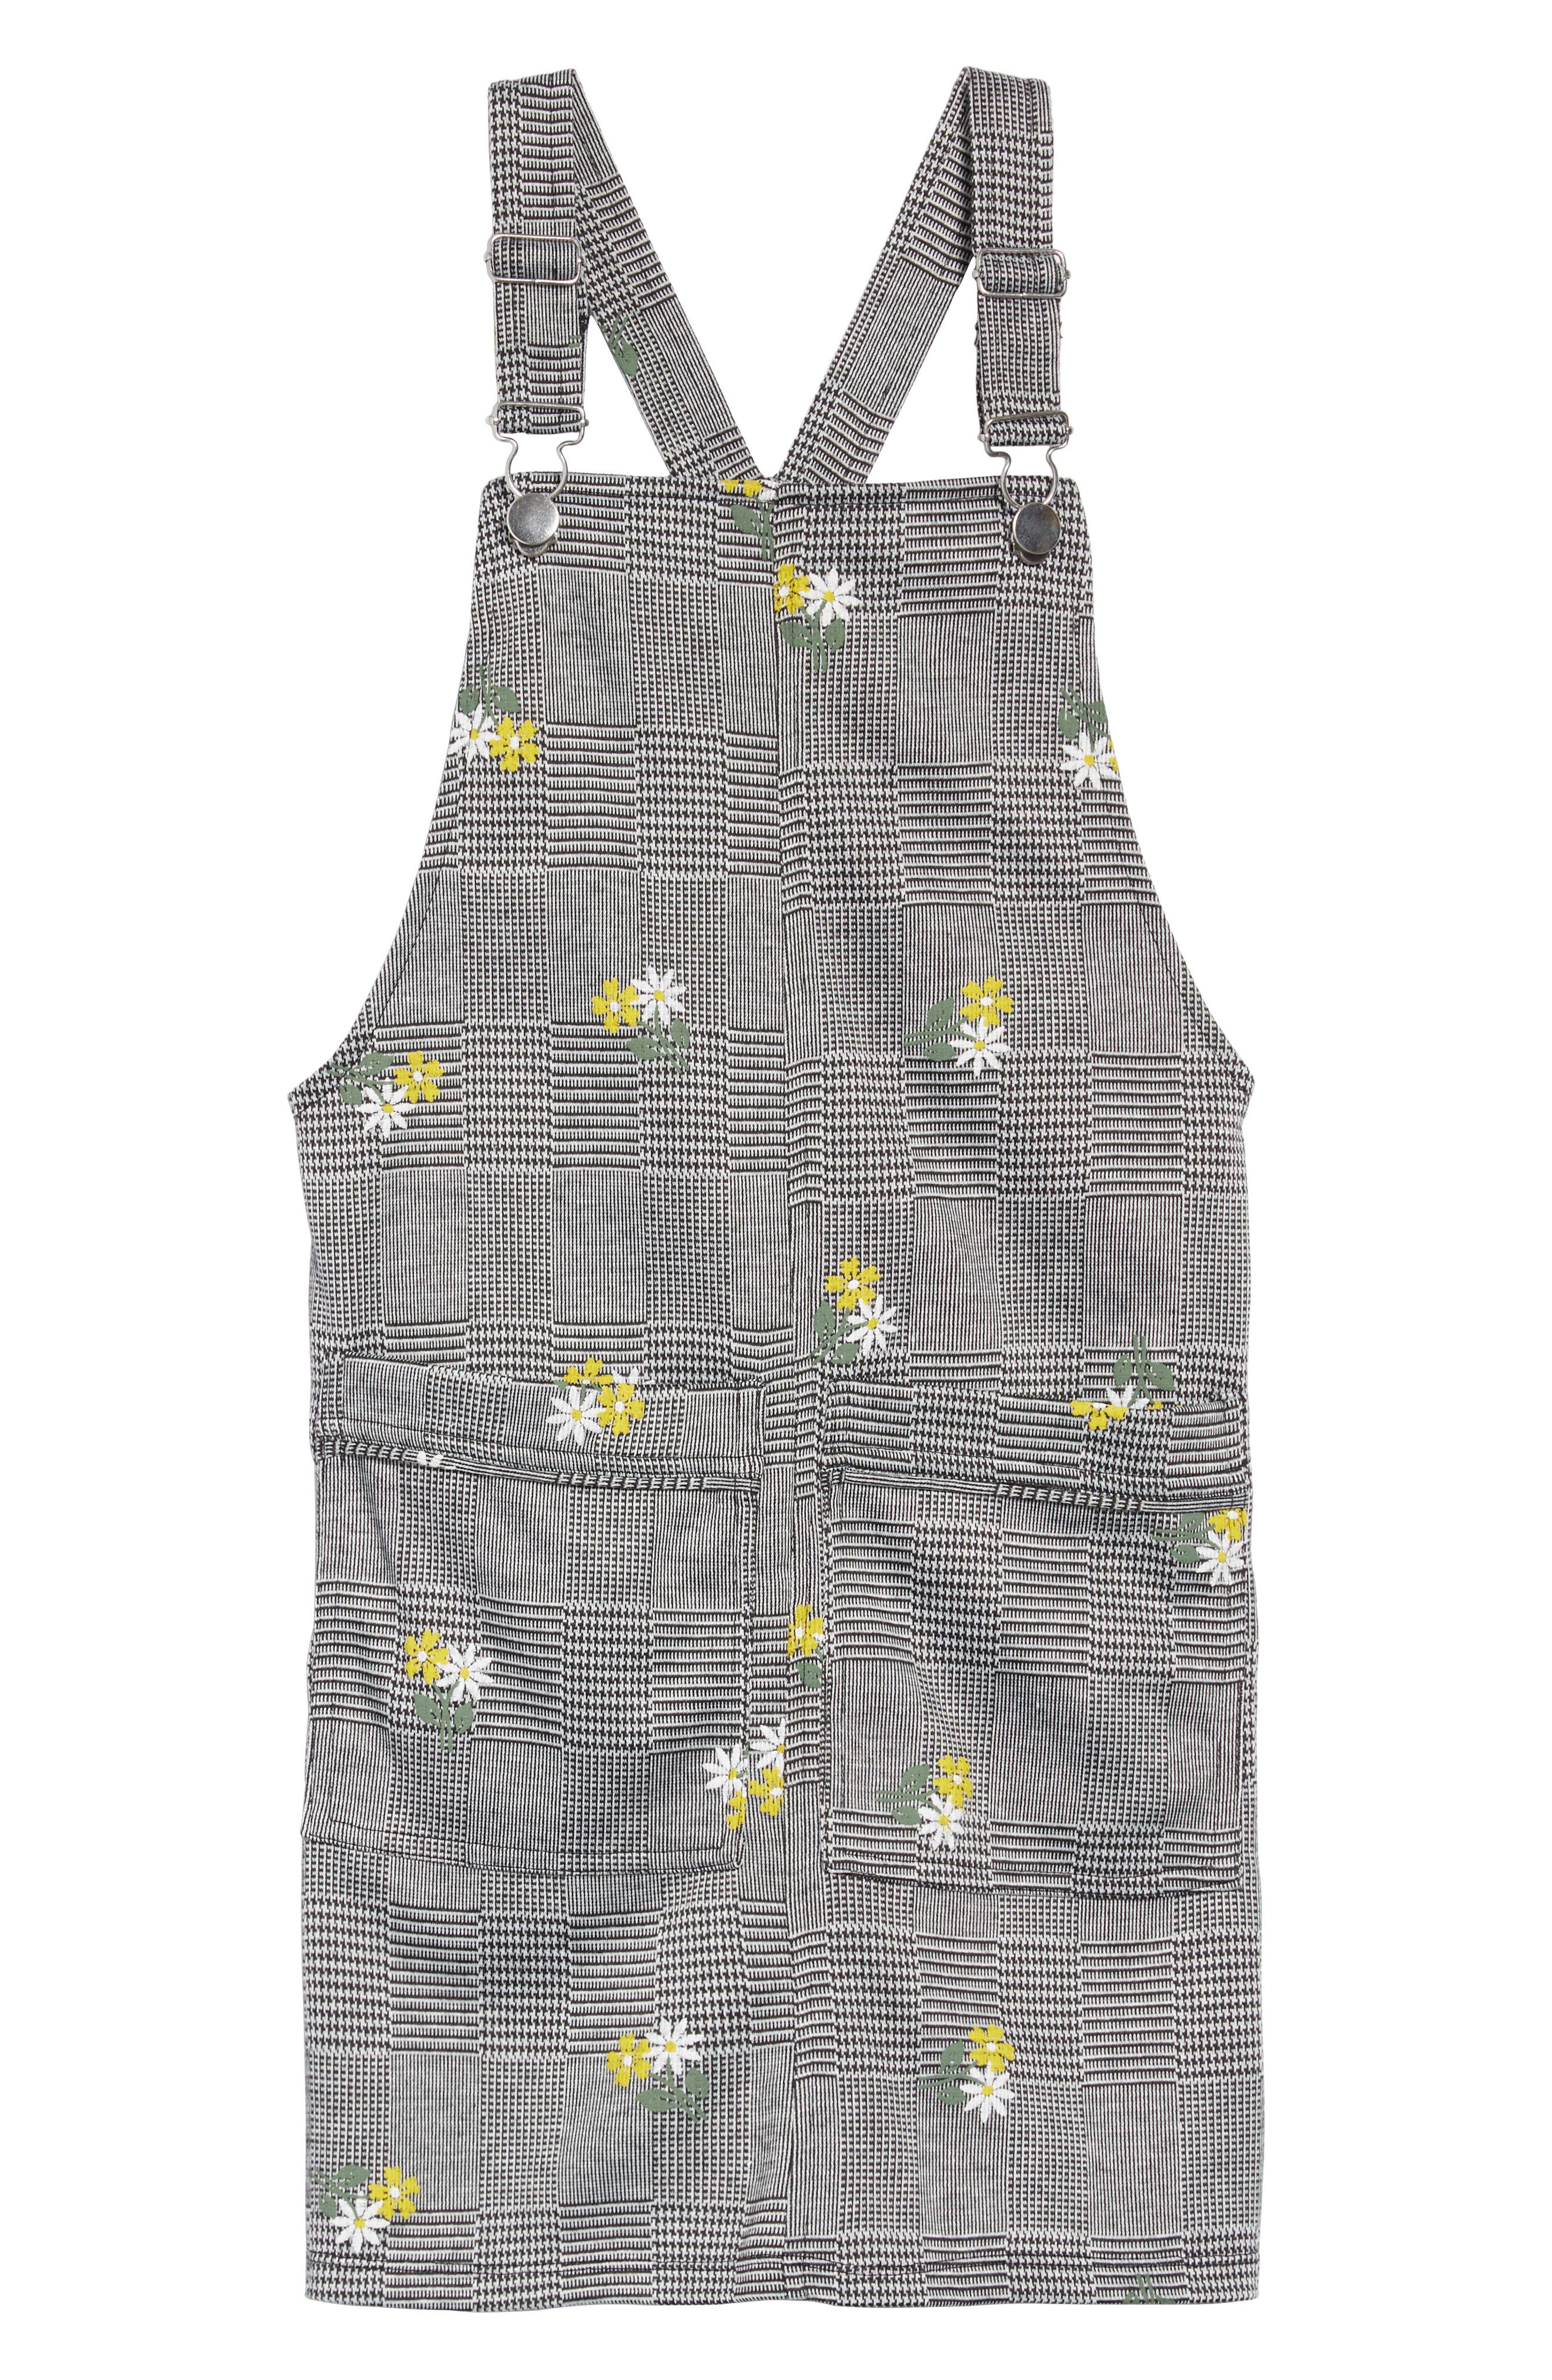 Embroidered Plaid Jumper,                         Main,                         color, BLACK/ WHITE PLAID